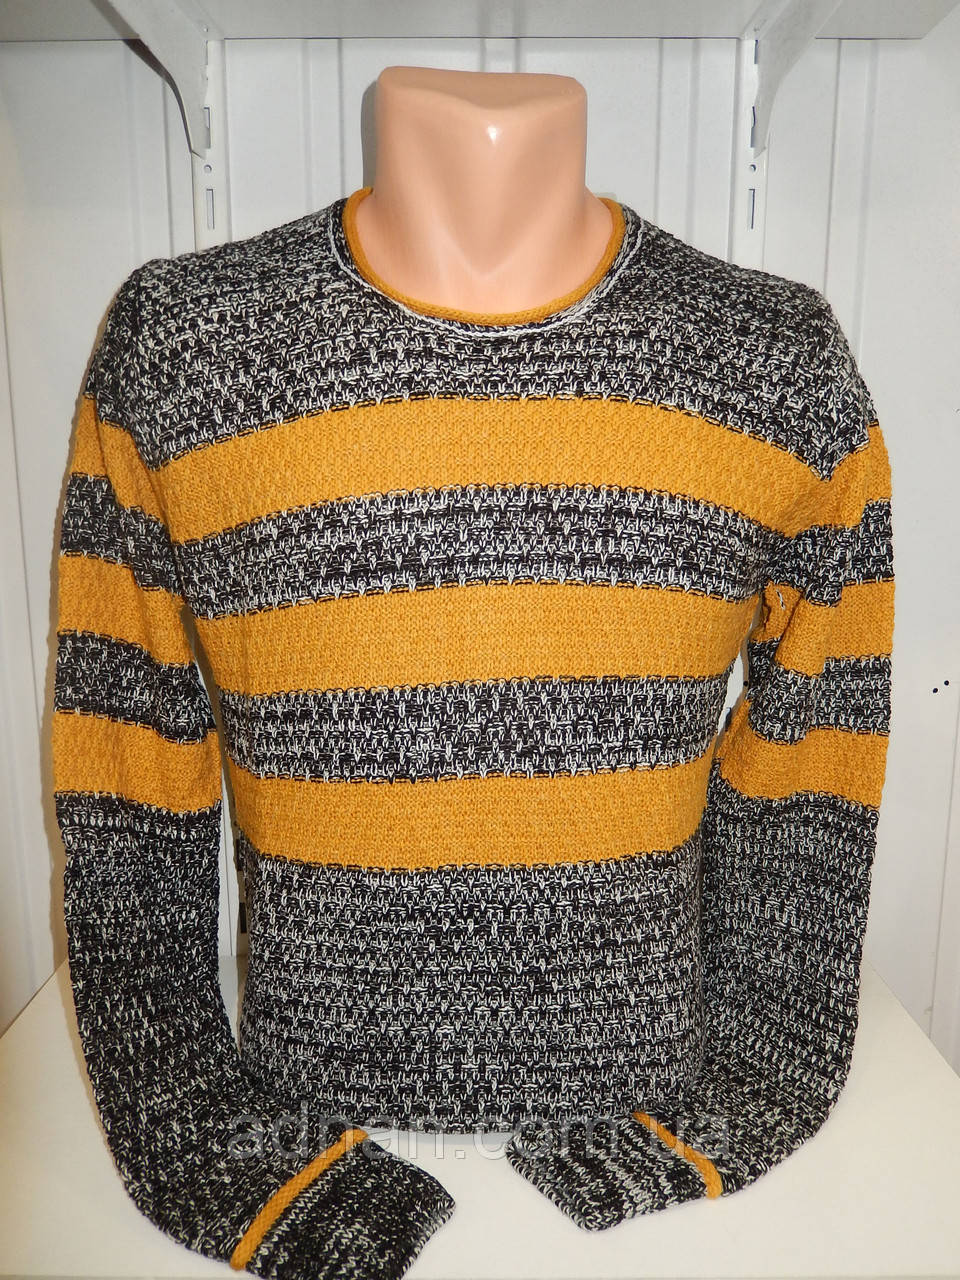 Свитер зимний ROT полосы 004/ купить оптом свитер зимний